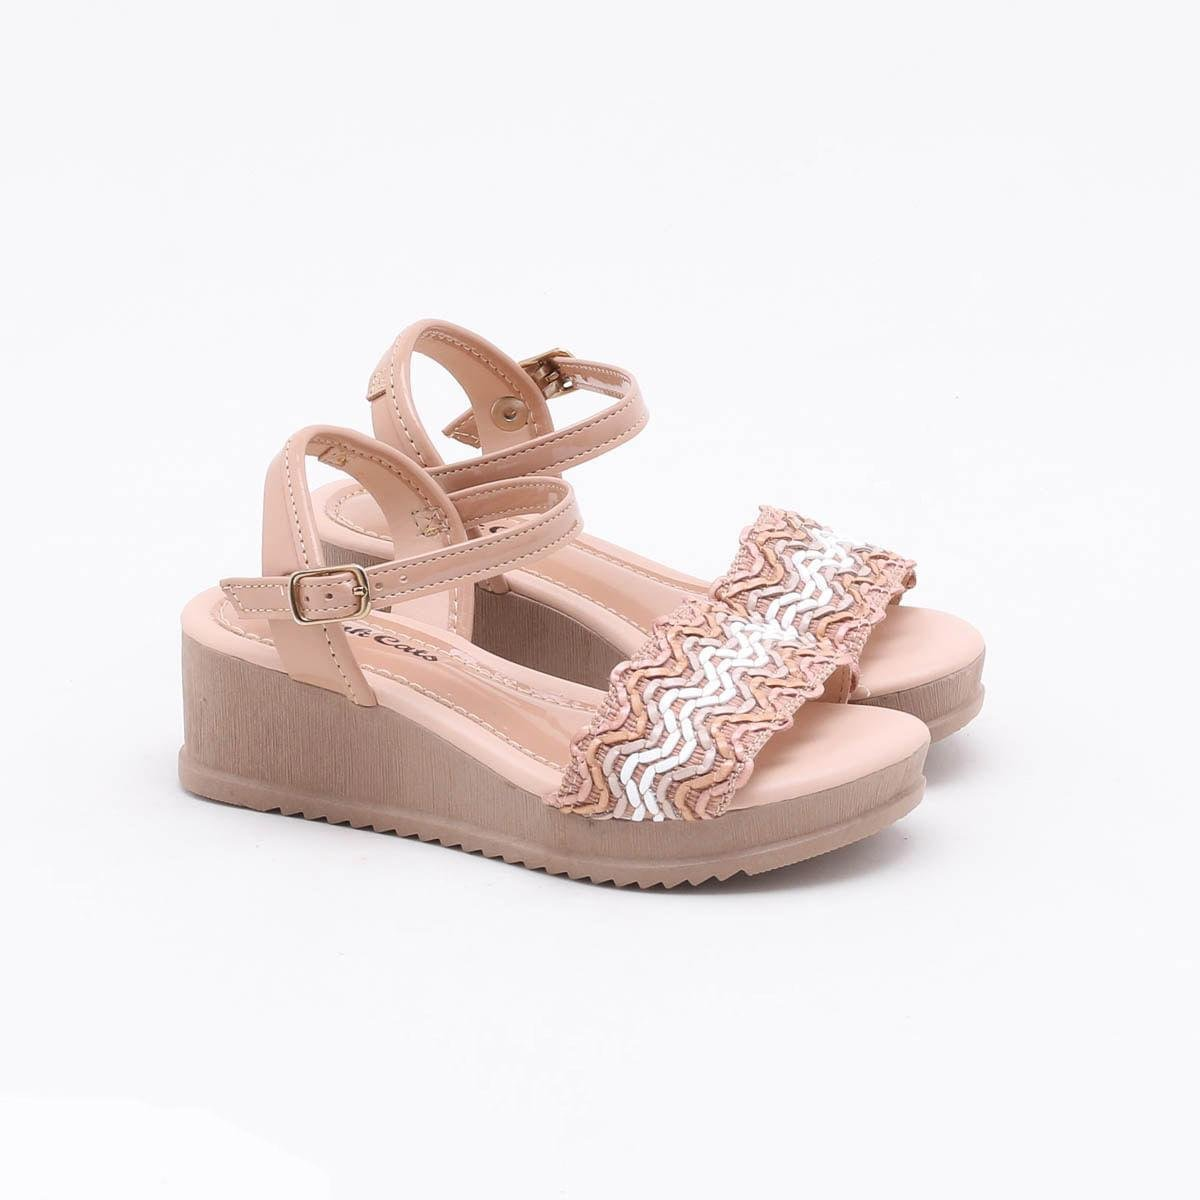 Sandalia Pink Cats Nude/Bege Feminino V1421